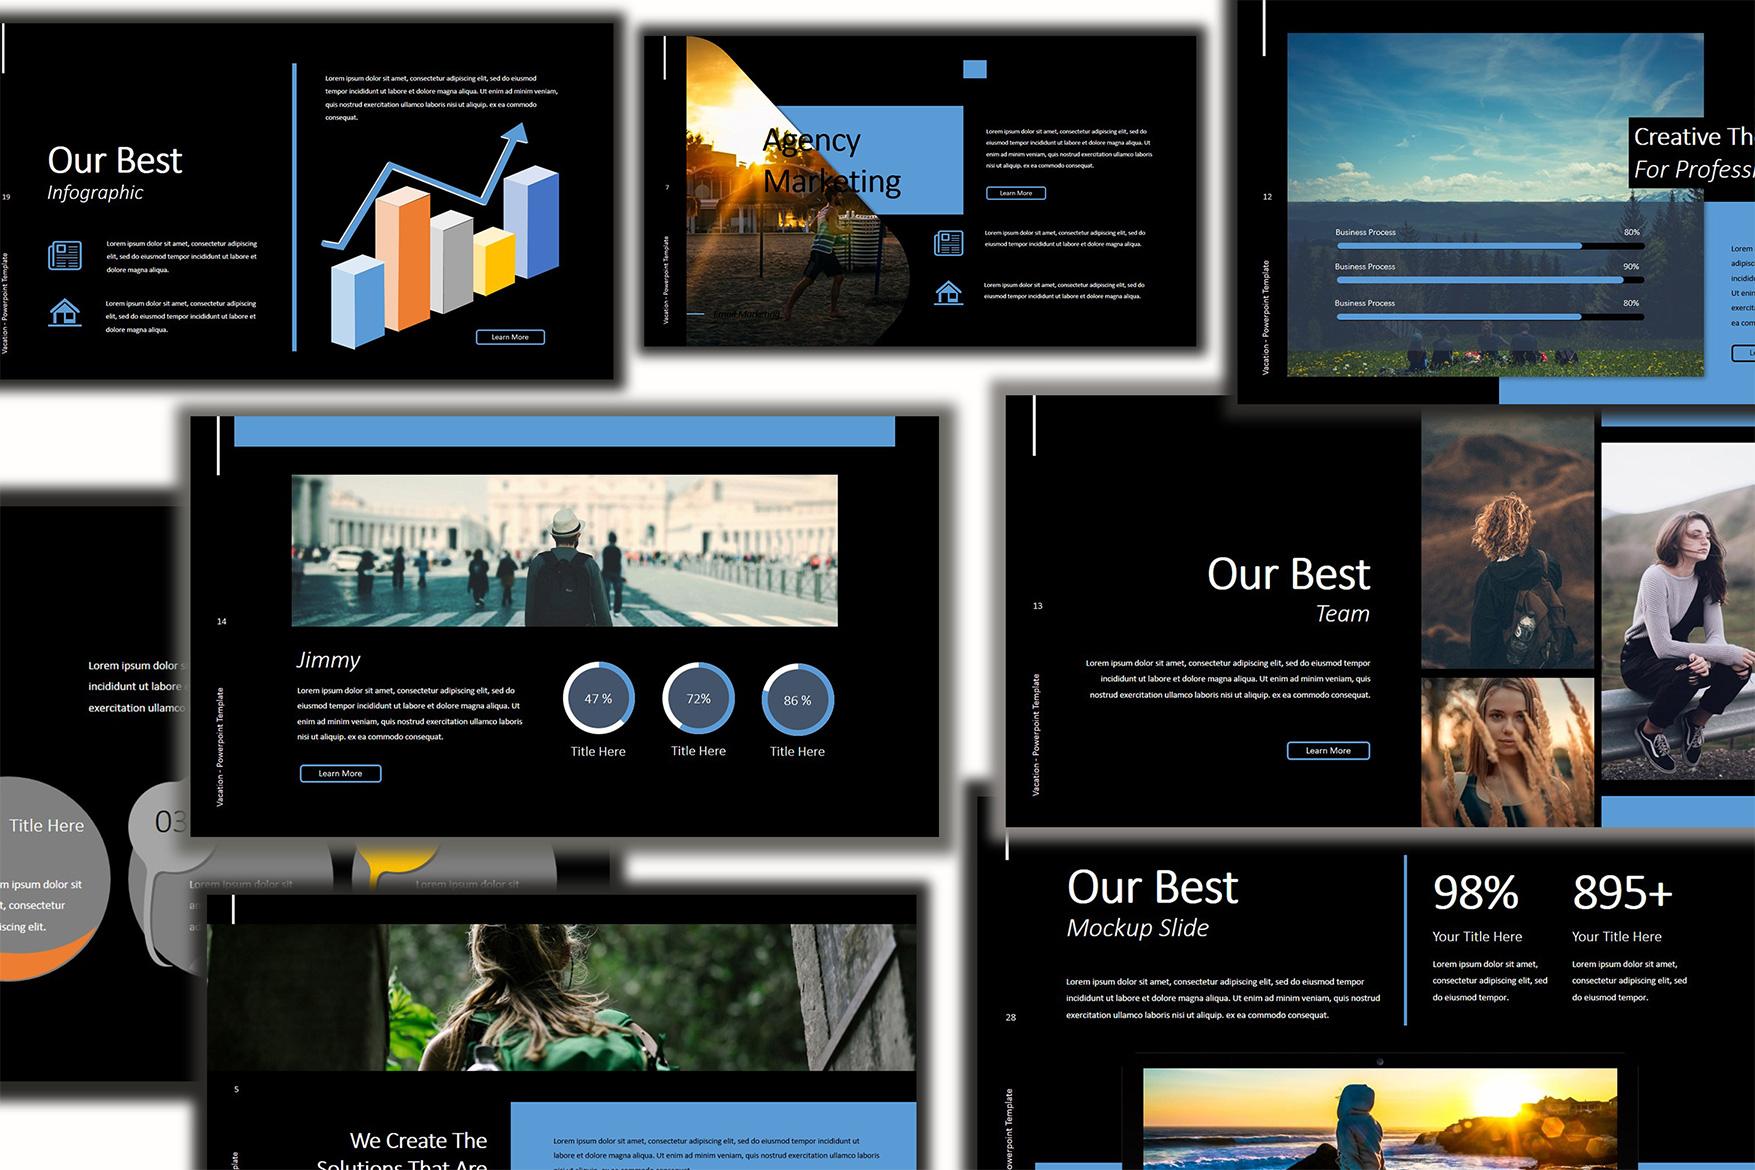 Vacation Lookbook Dark Google Slides Presentation example image 3